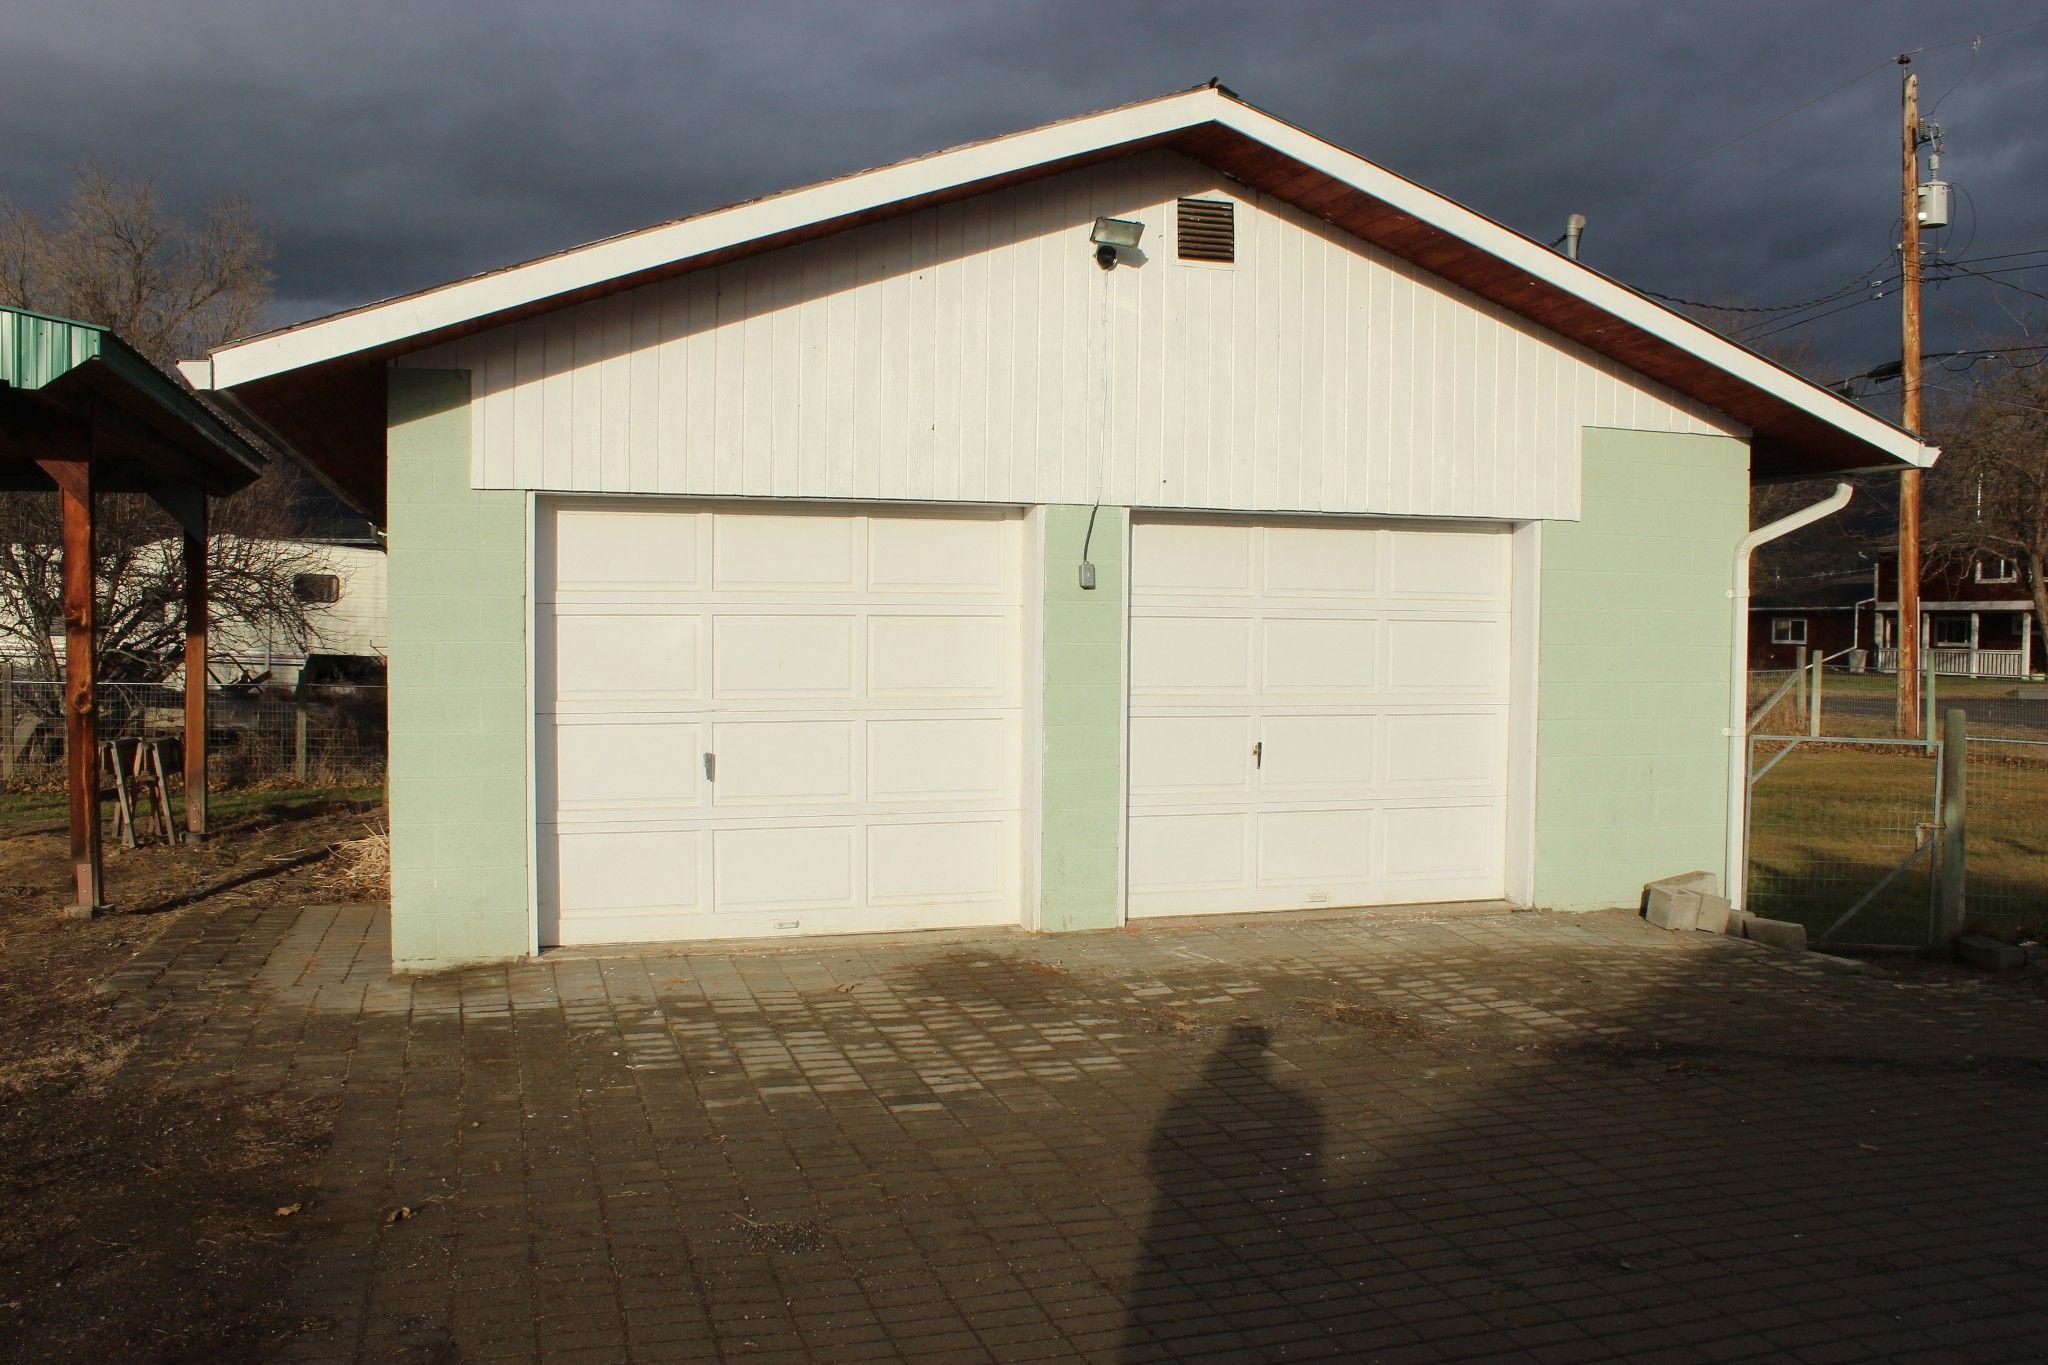 Photo 14: Photos: 6725 Heffley Road in Kamloops: Heffley House for sale : MLS®# 160007